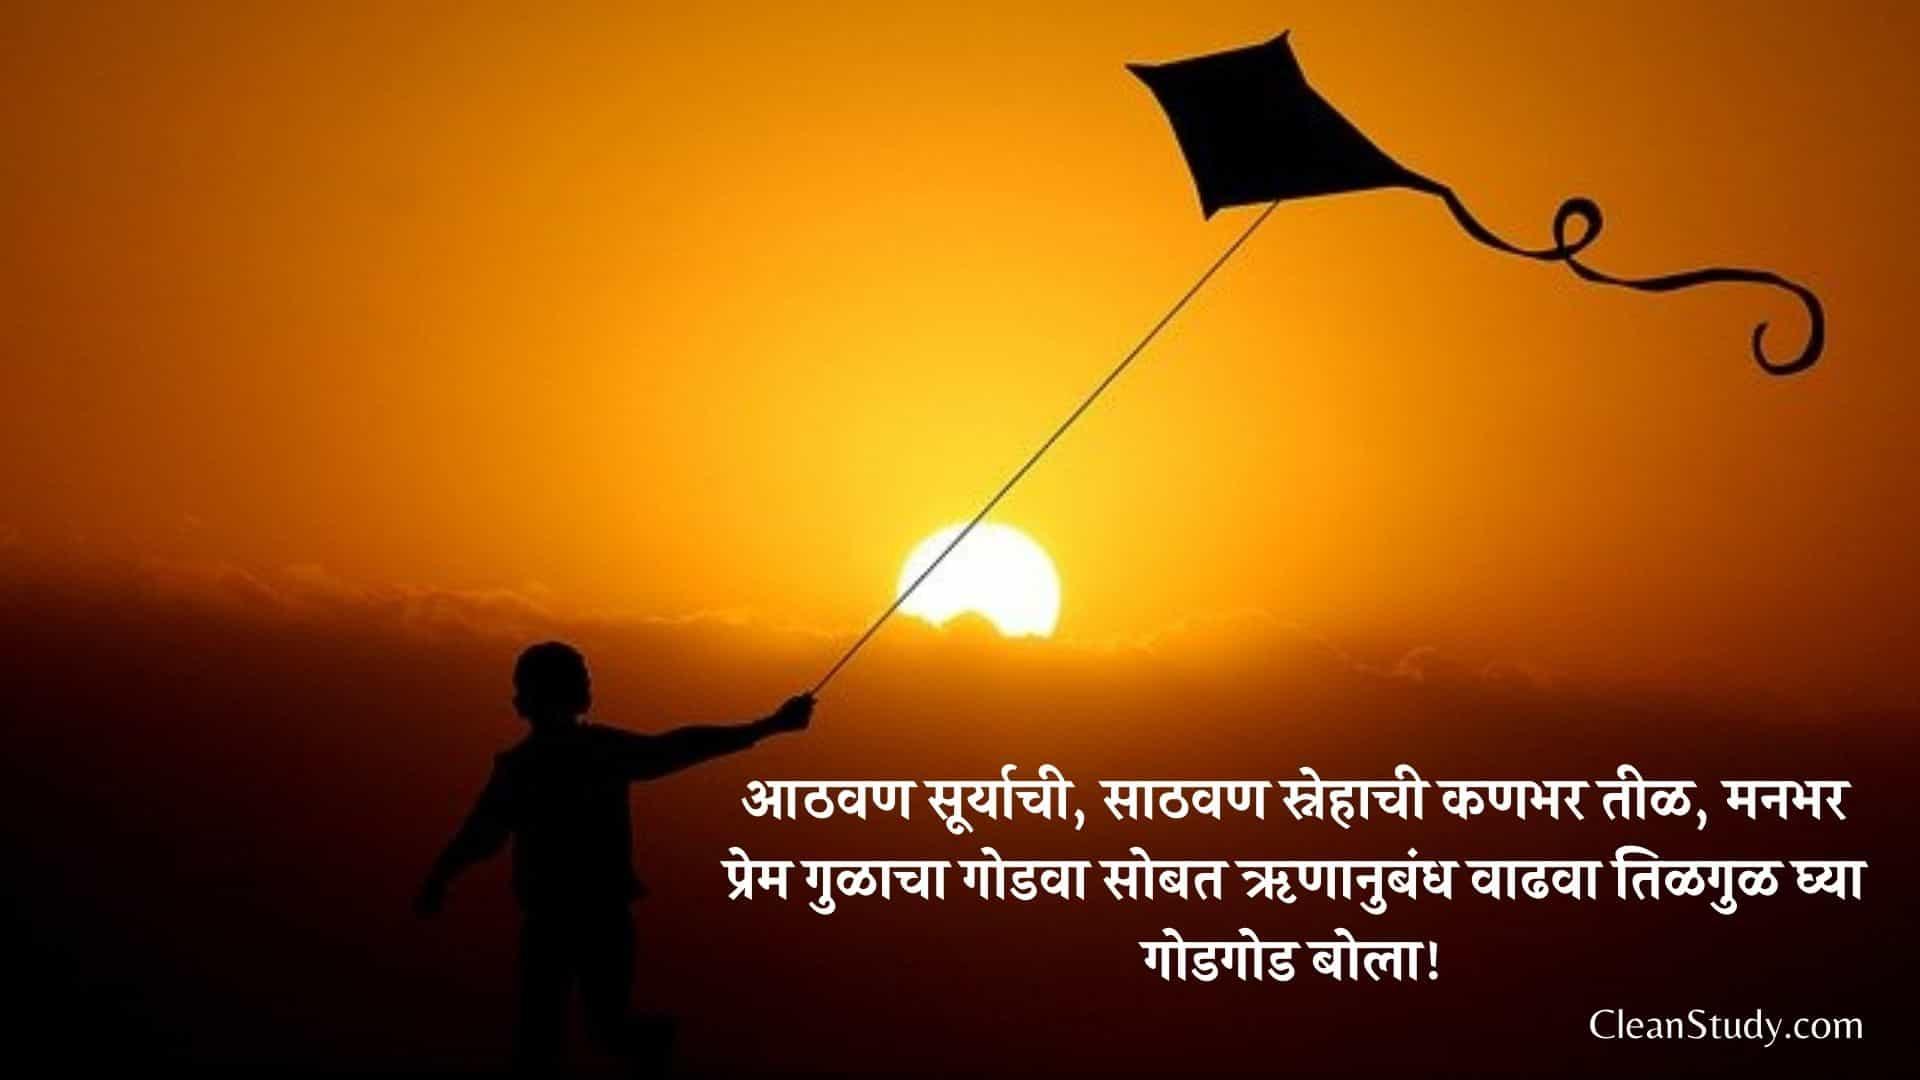 Makar Sankranti Wishes in Marathi 2021